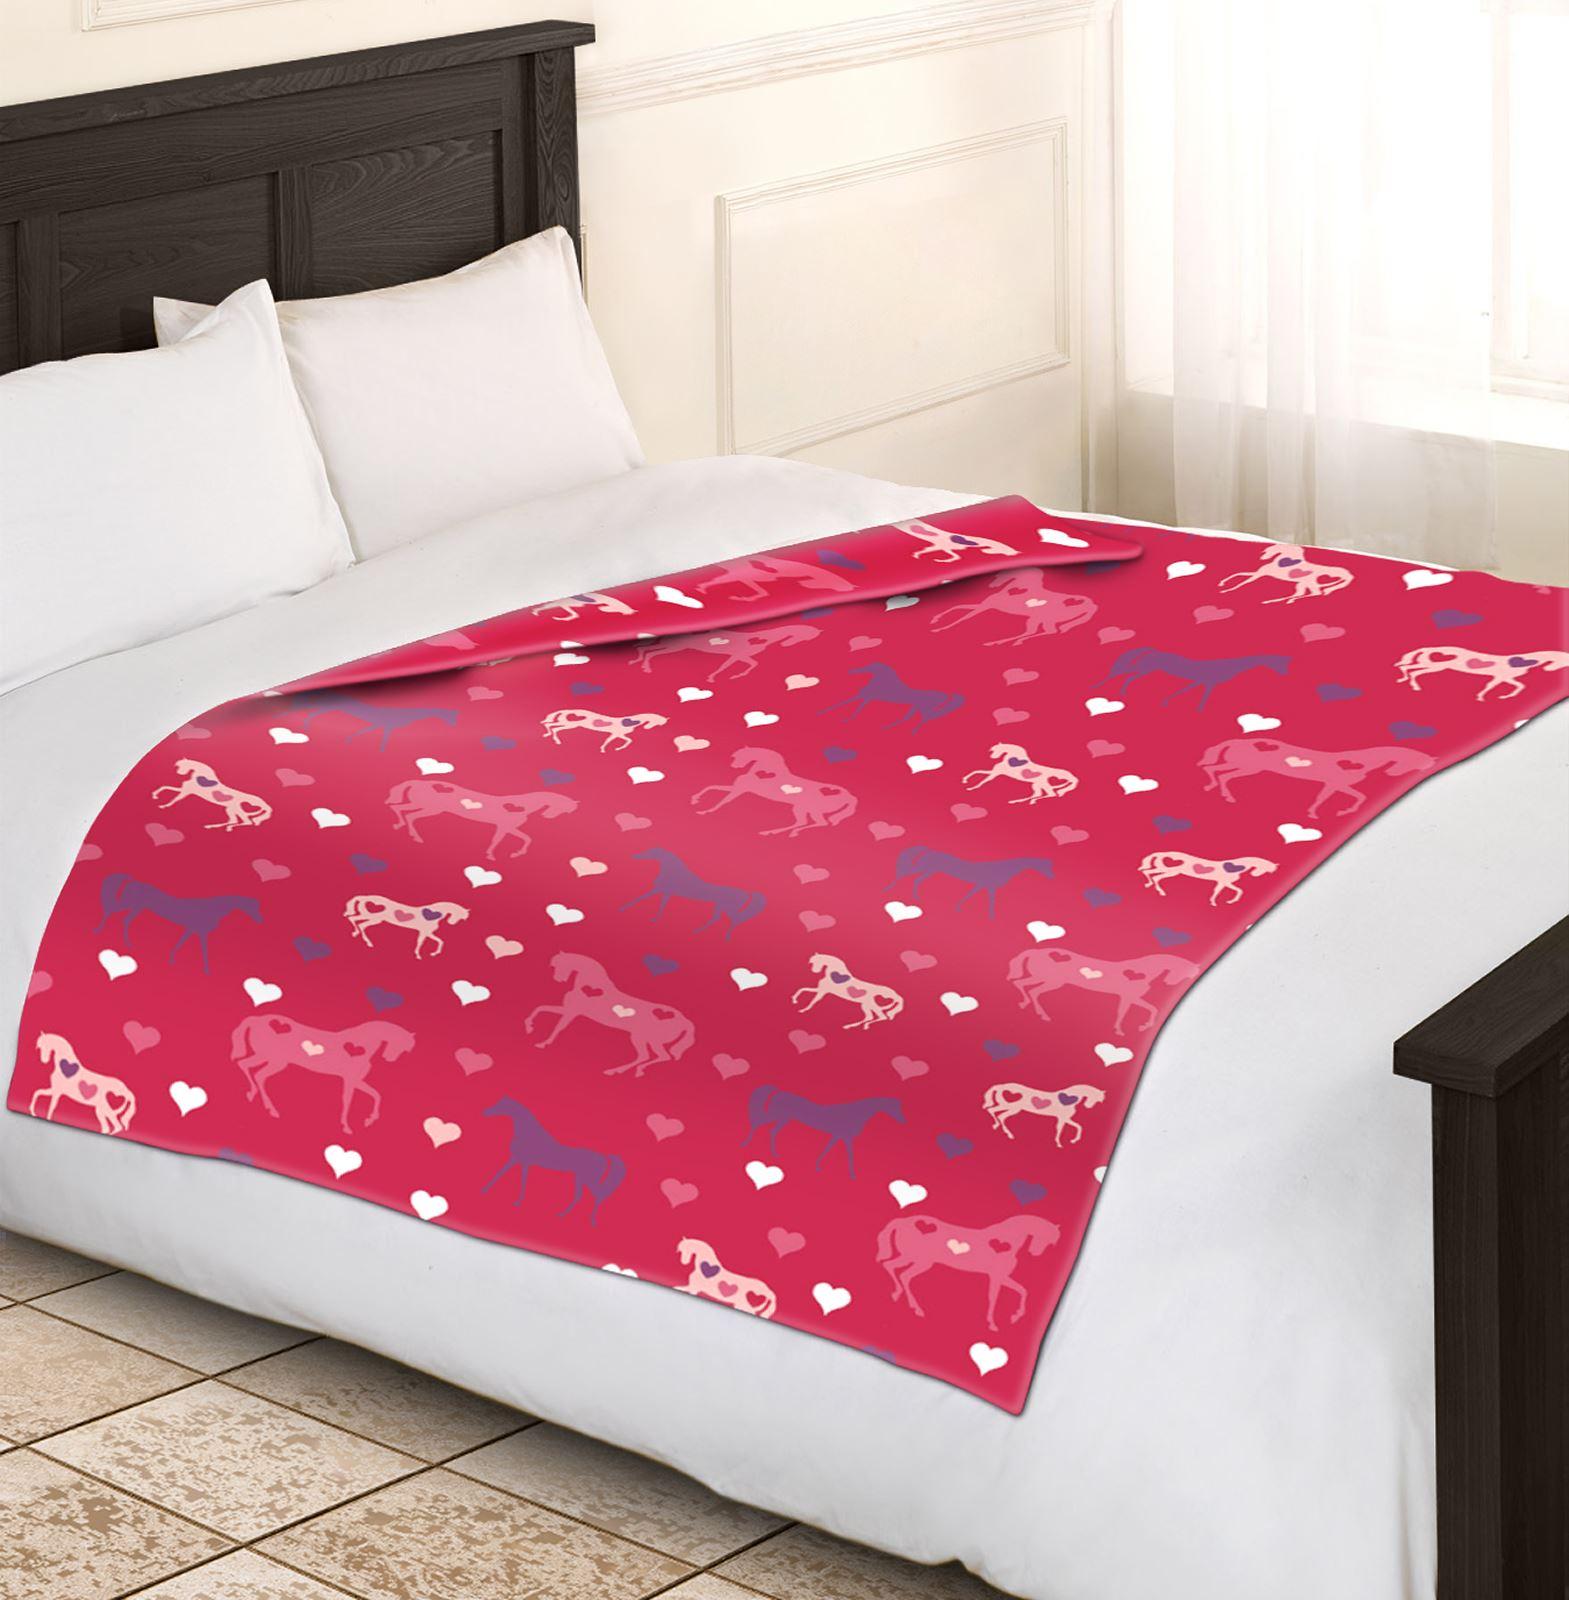 pink sofa dating uk moroso field girls soft and warm single horse fleece blankets